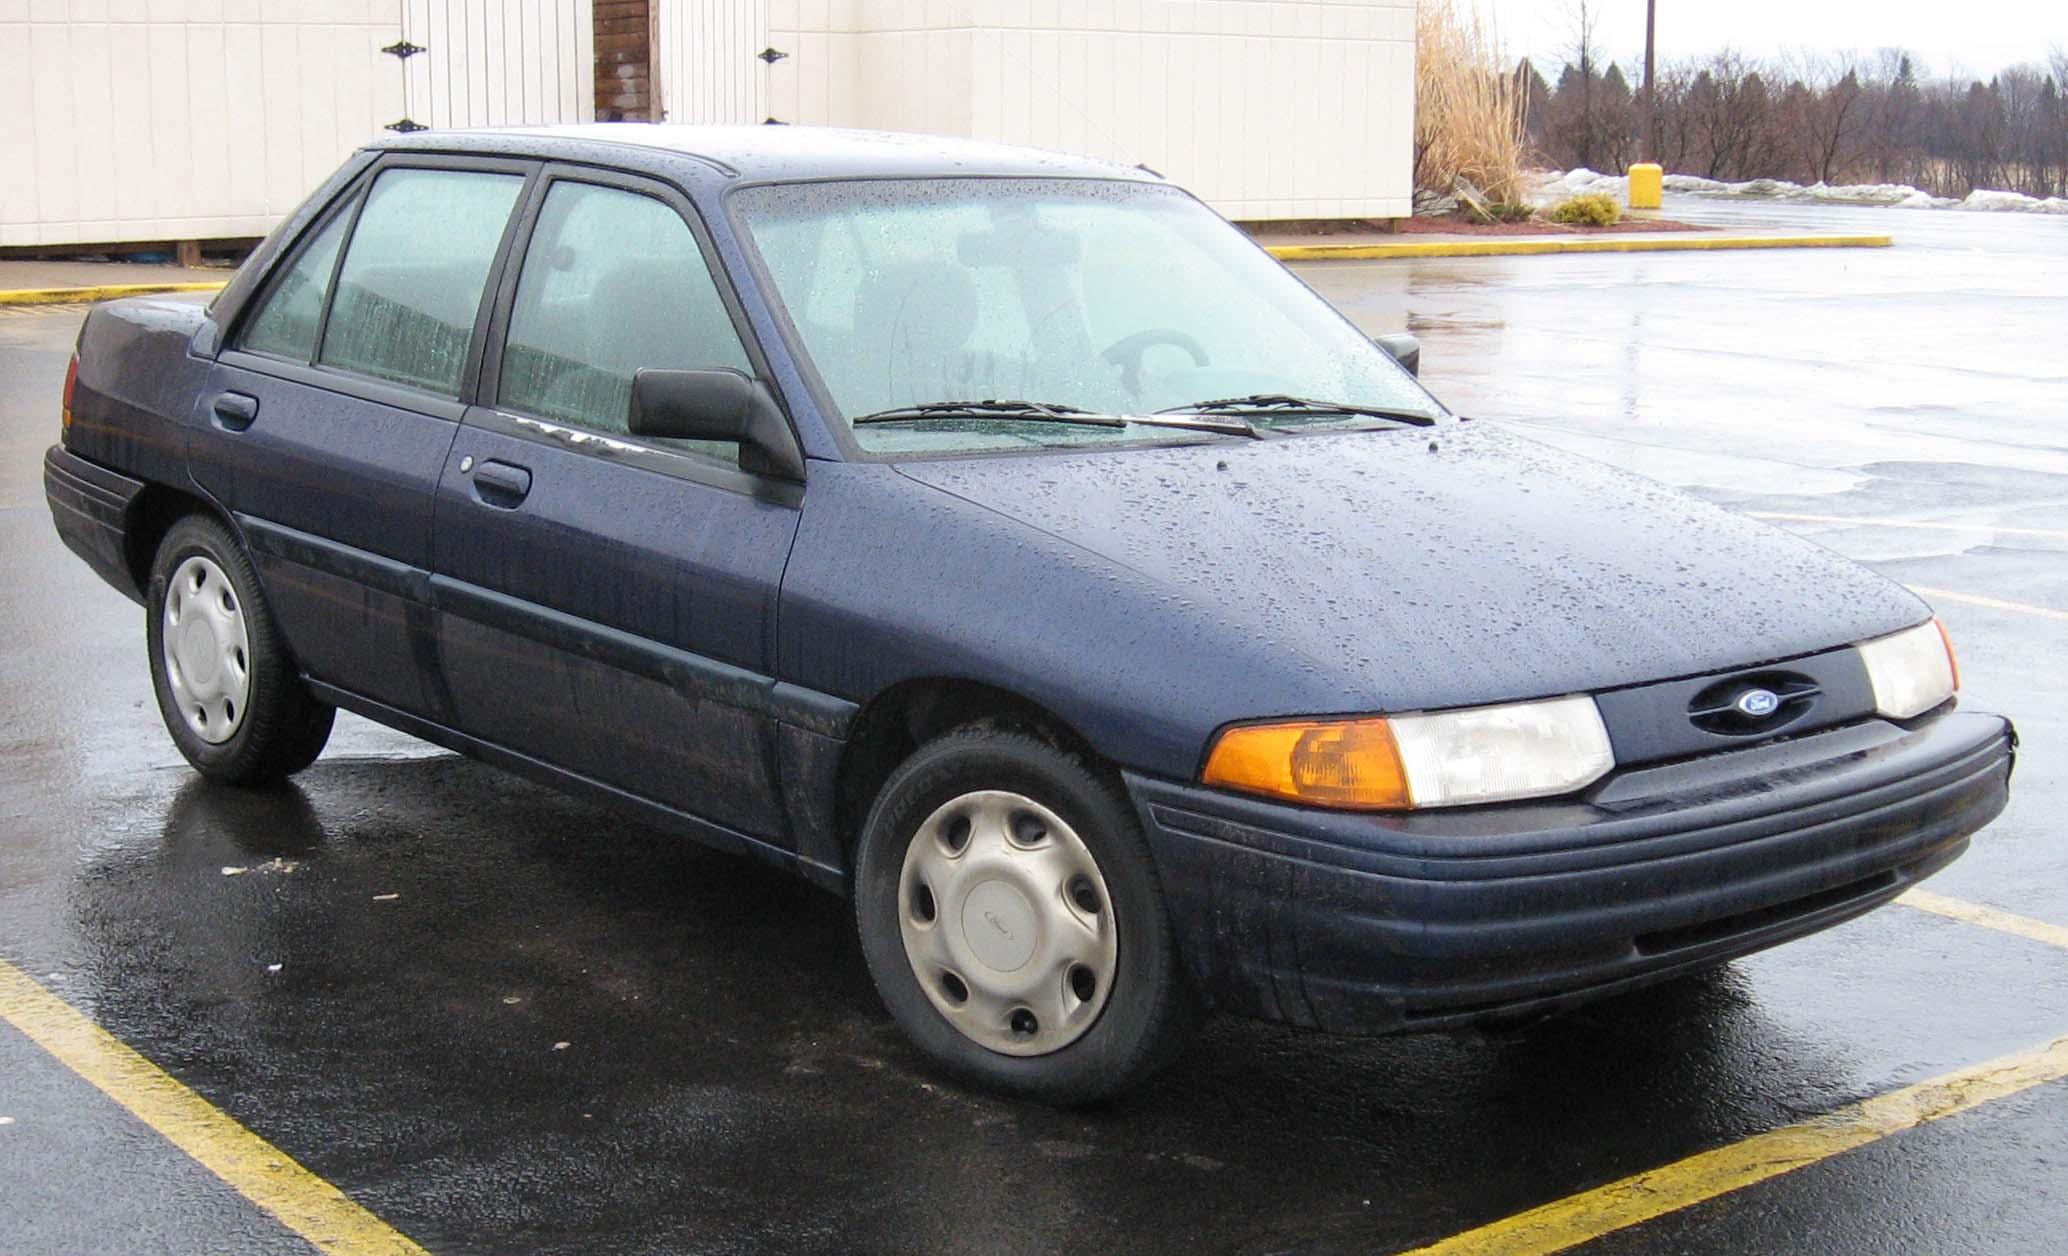 Fichier 95 96 Ford Escort Lx Sedan Jpg Wikip 233 Dia